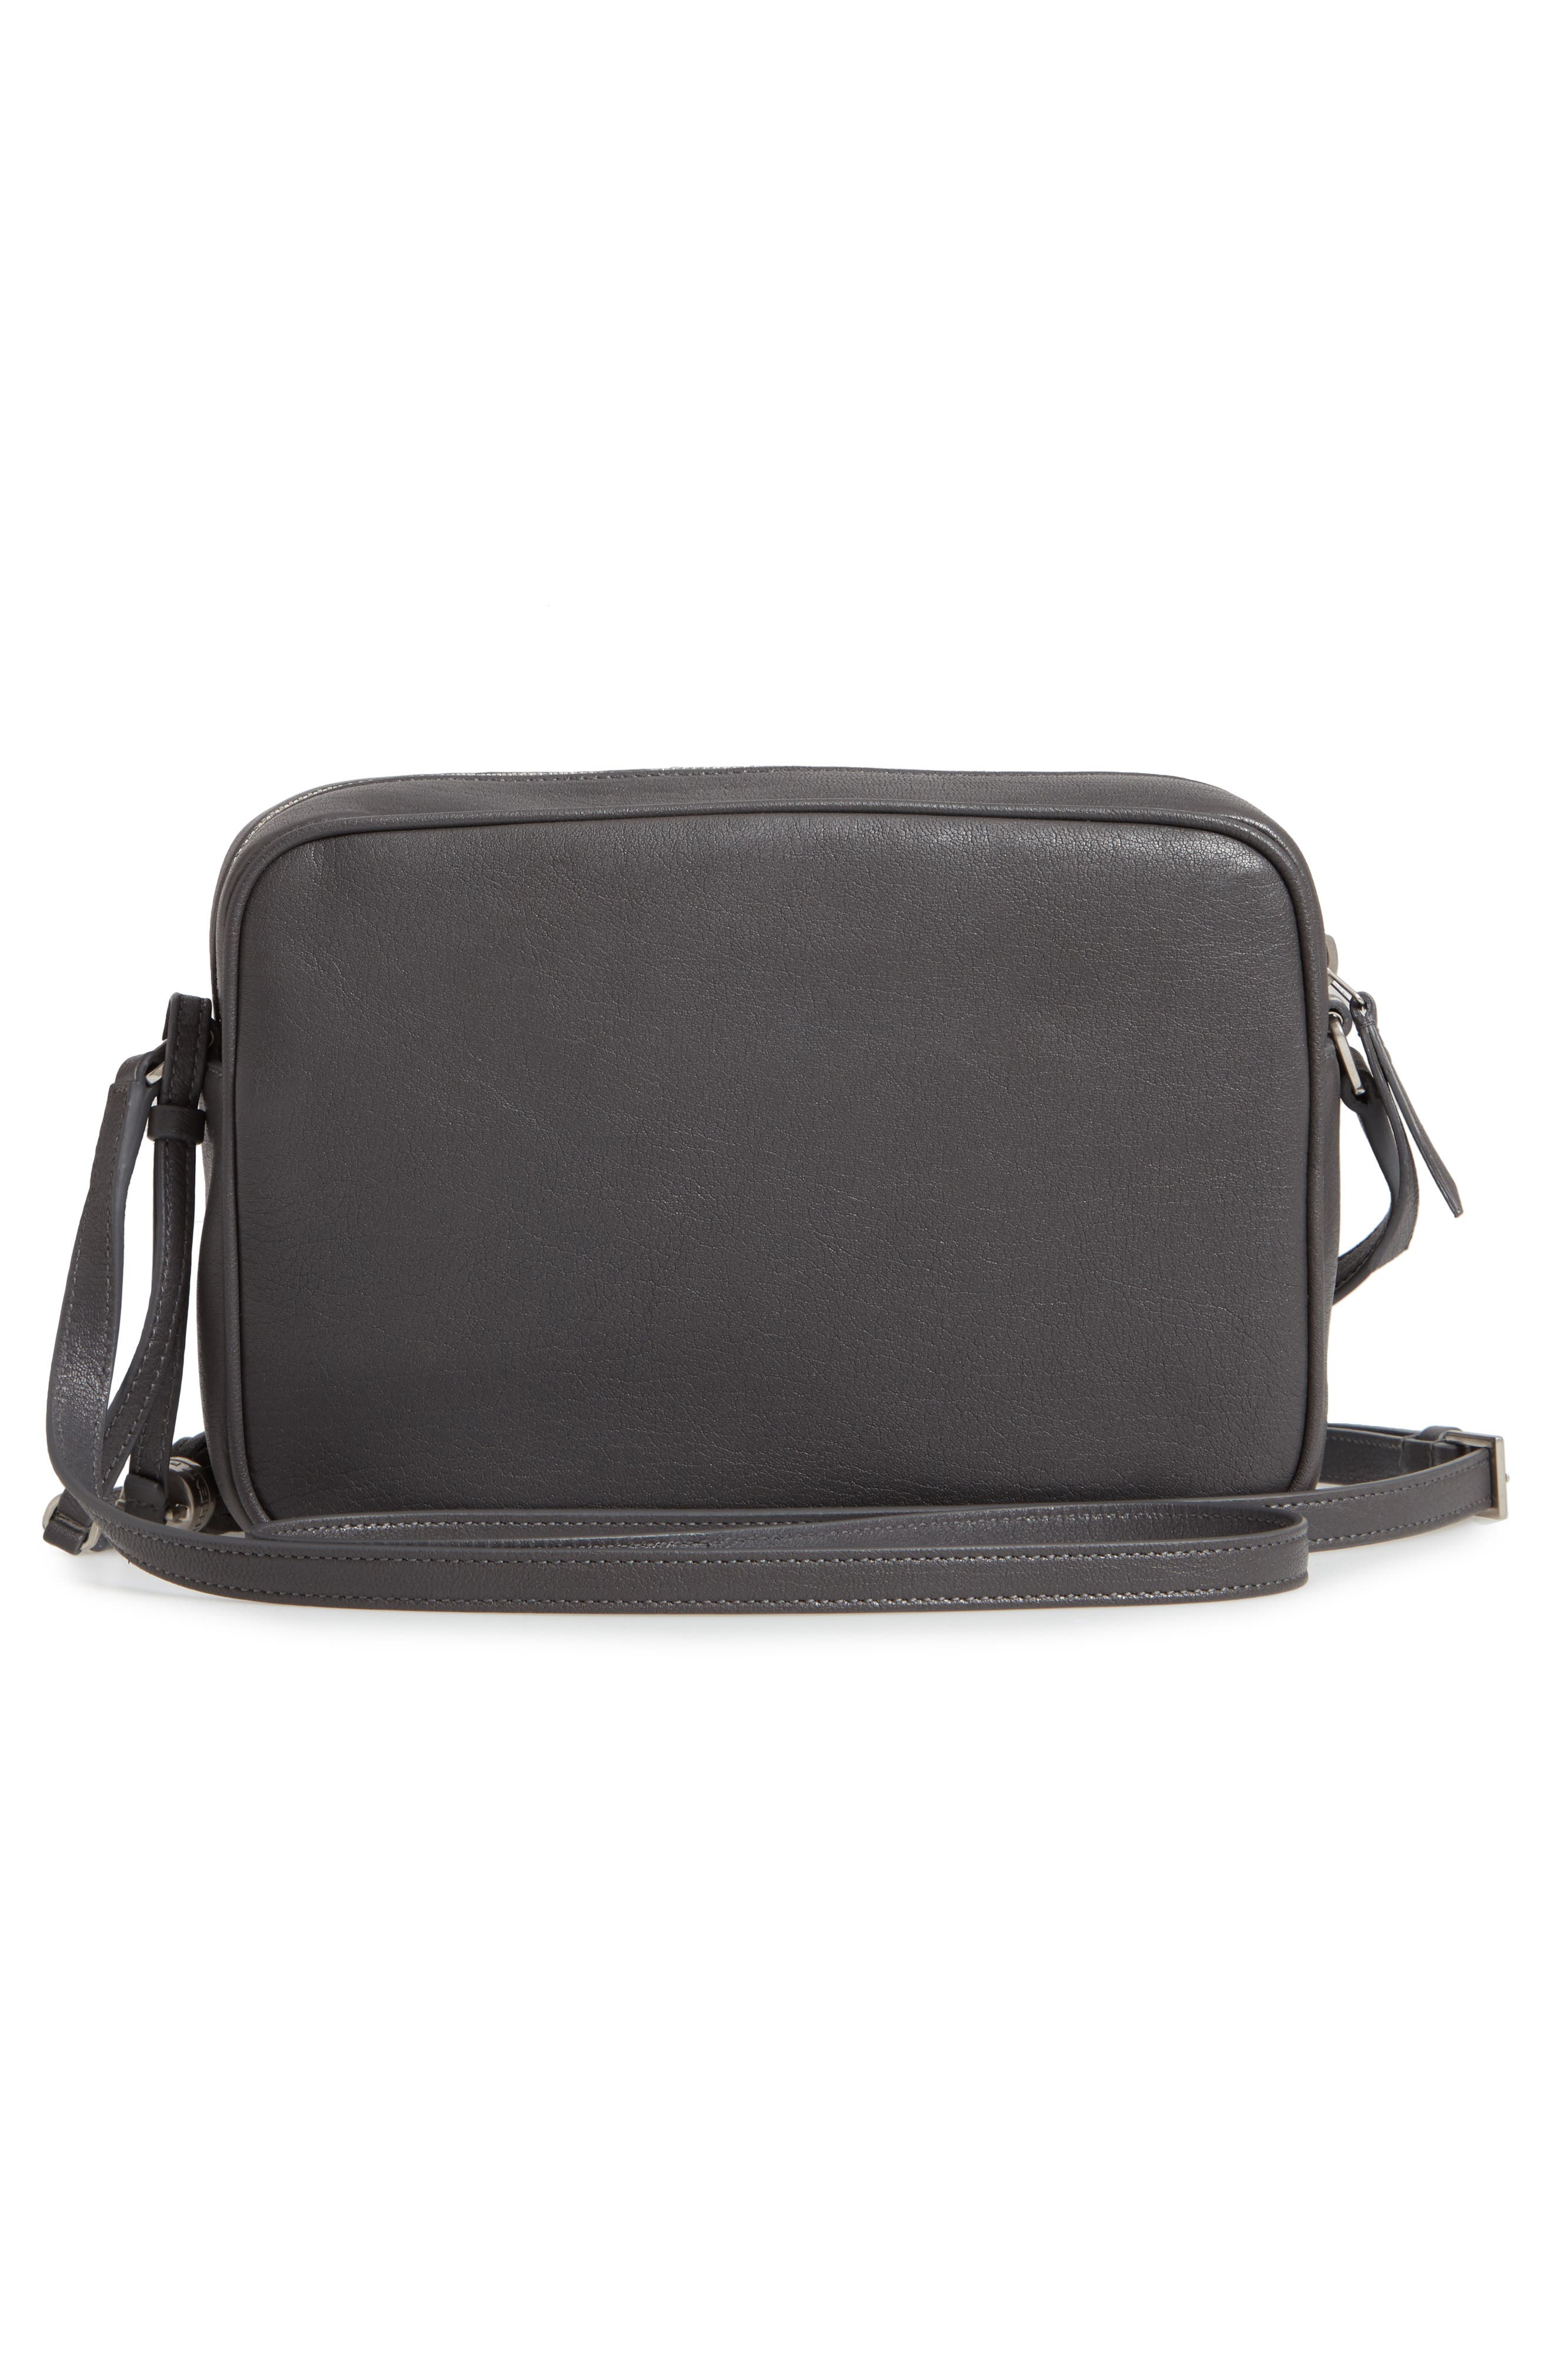 SAINT LAURENT, Small Mono Leather Camera Bag, Alternate thumbnail 3, color, STORM